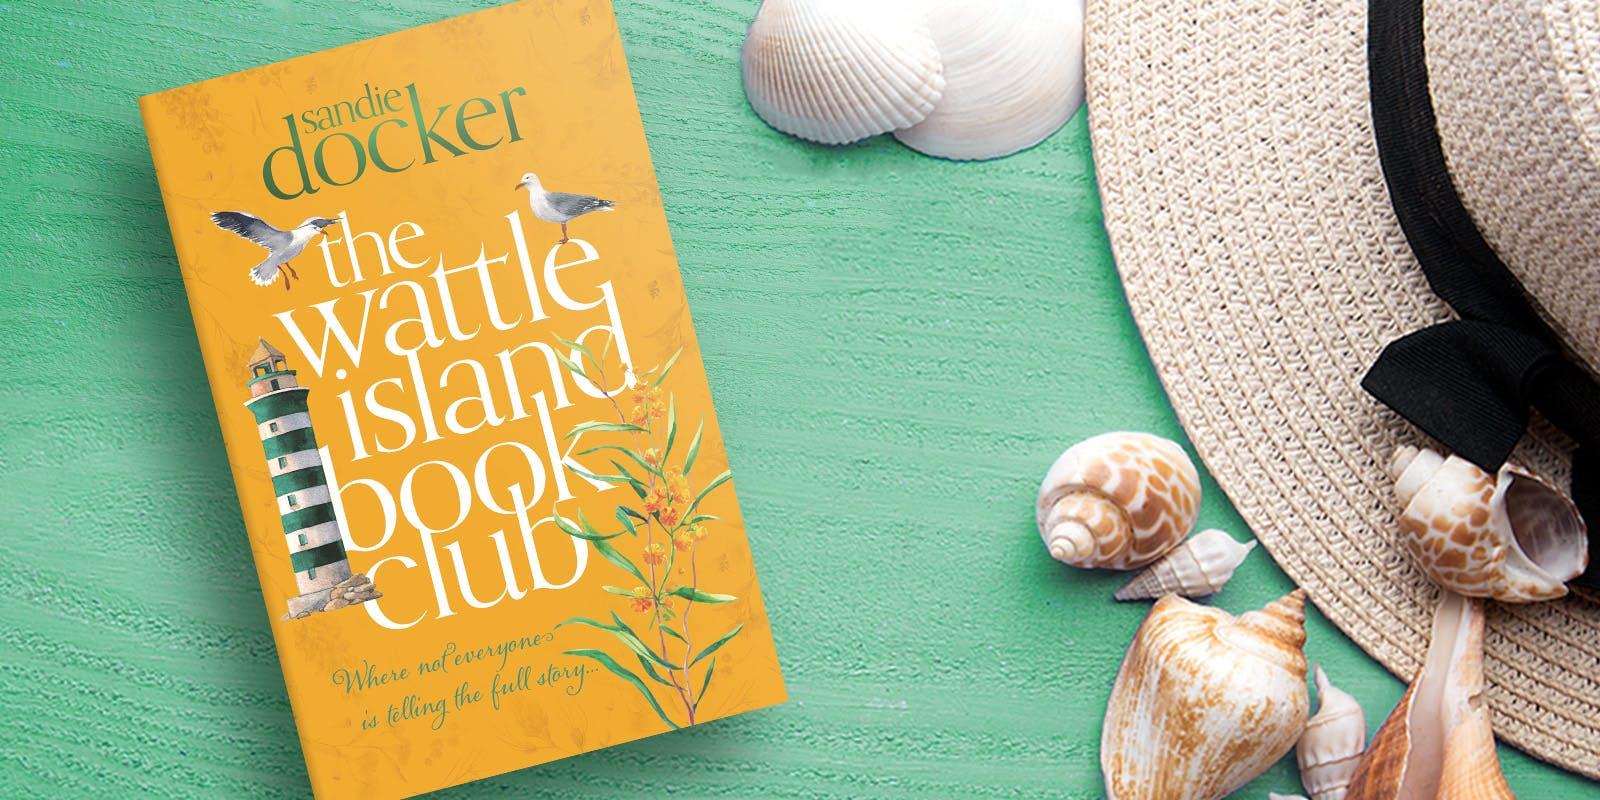 Wattle Island Book Club book club notes